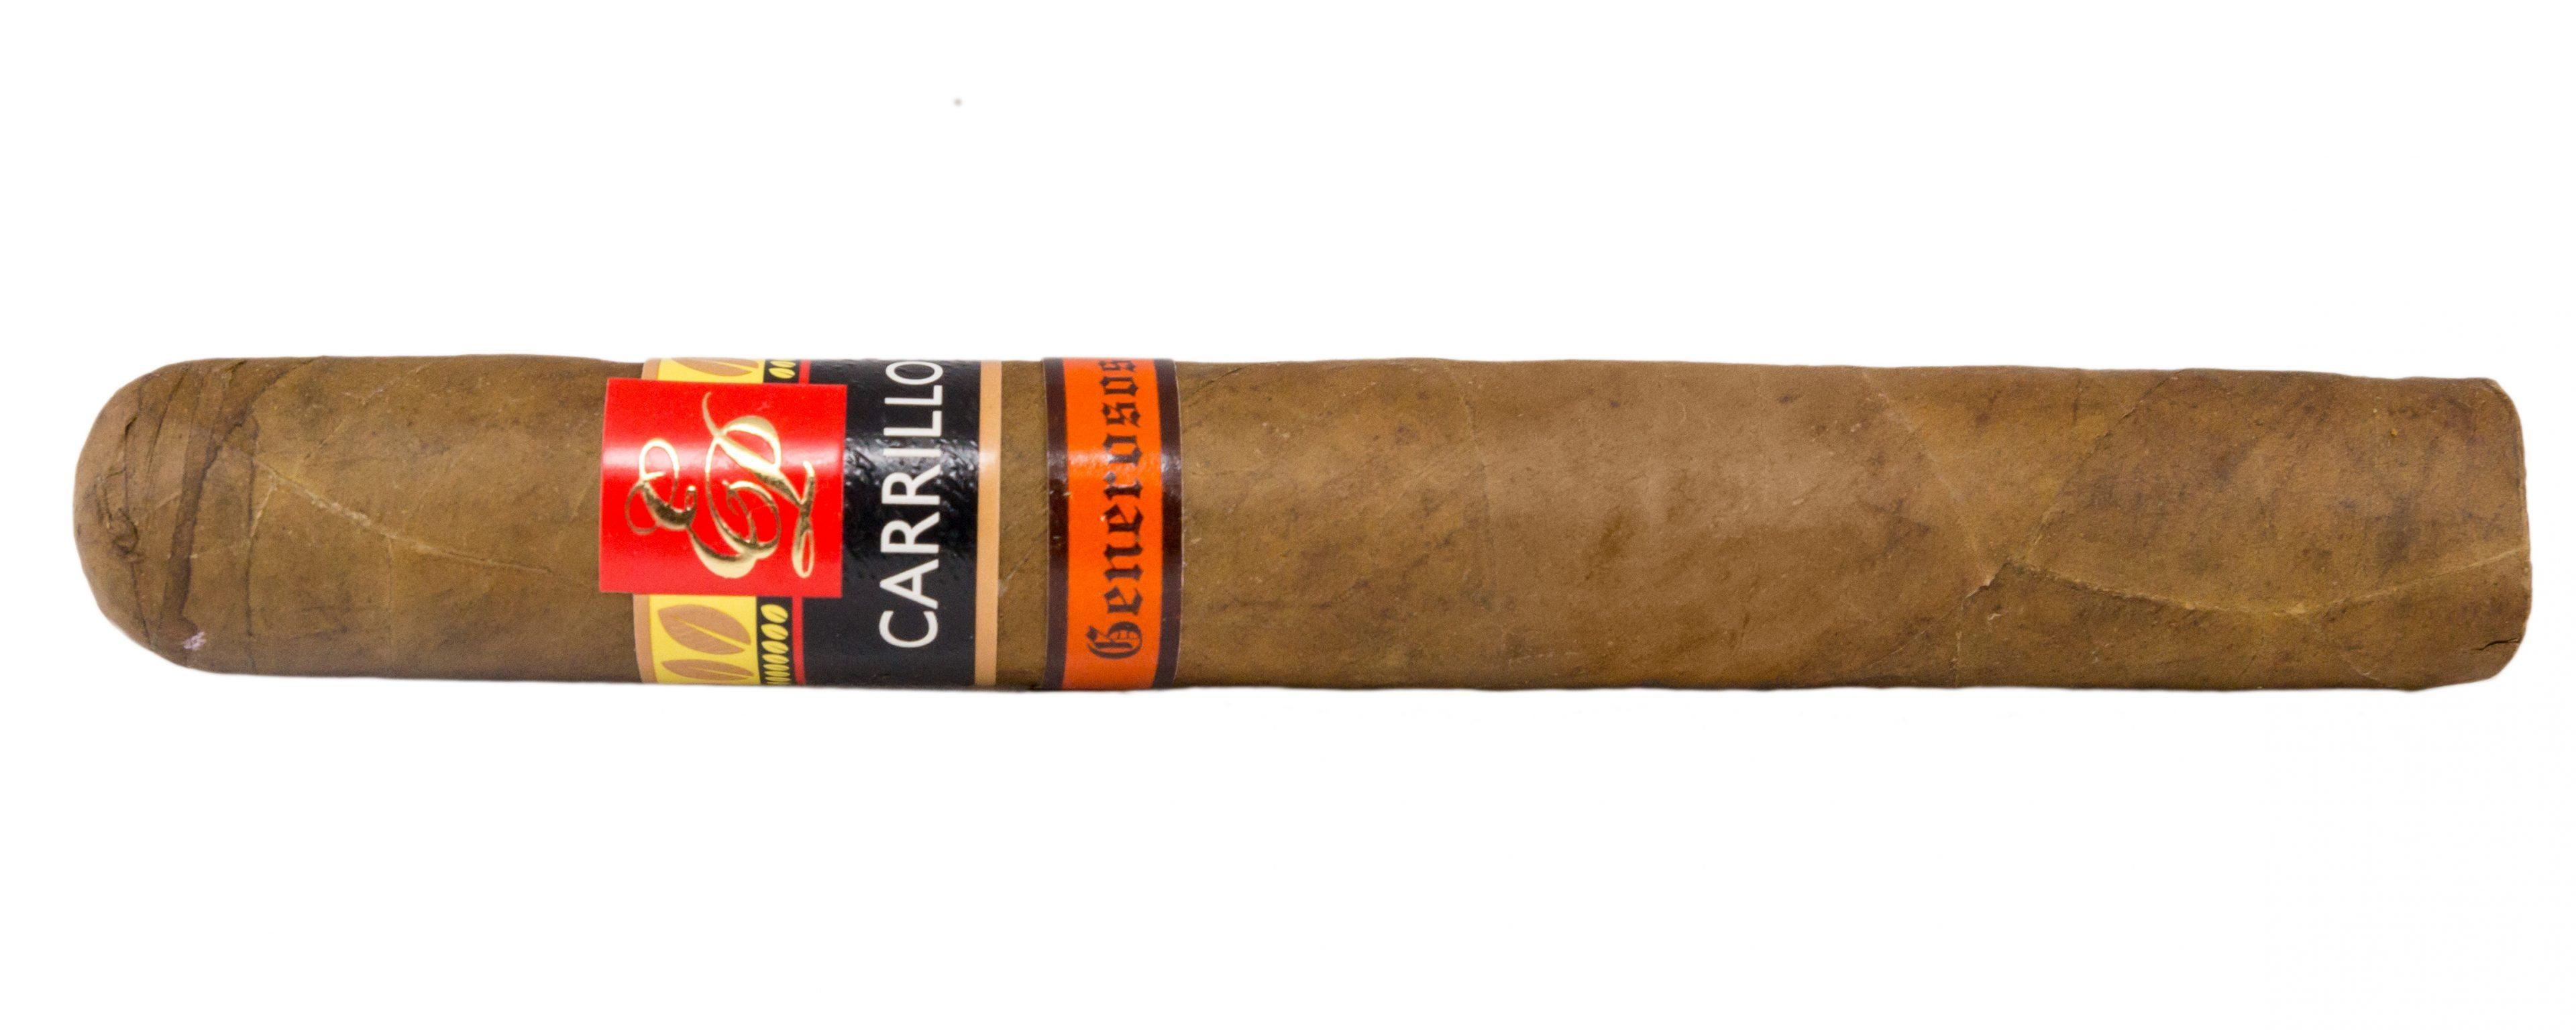 Blind Cigar Review: E.P. Carrillo   Generosos Toro